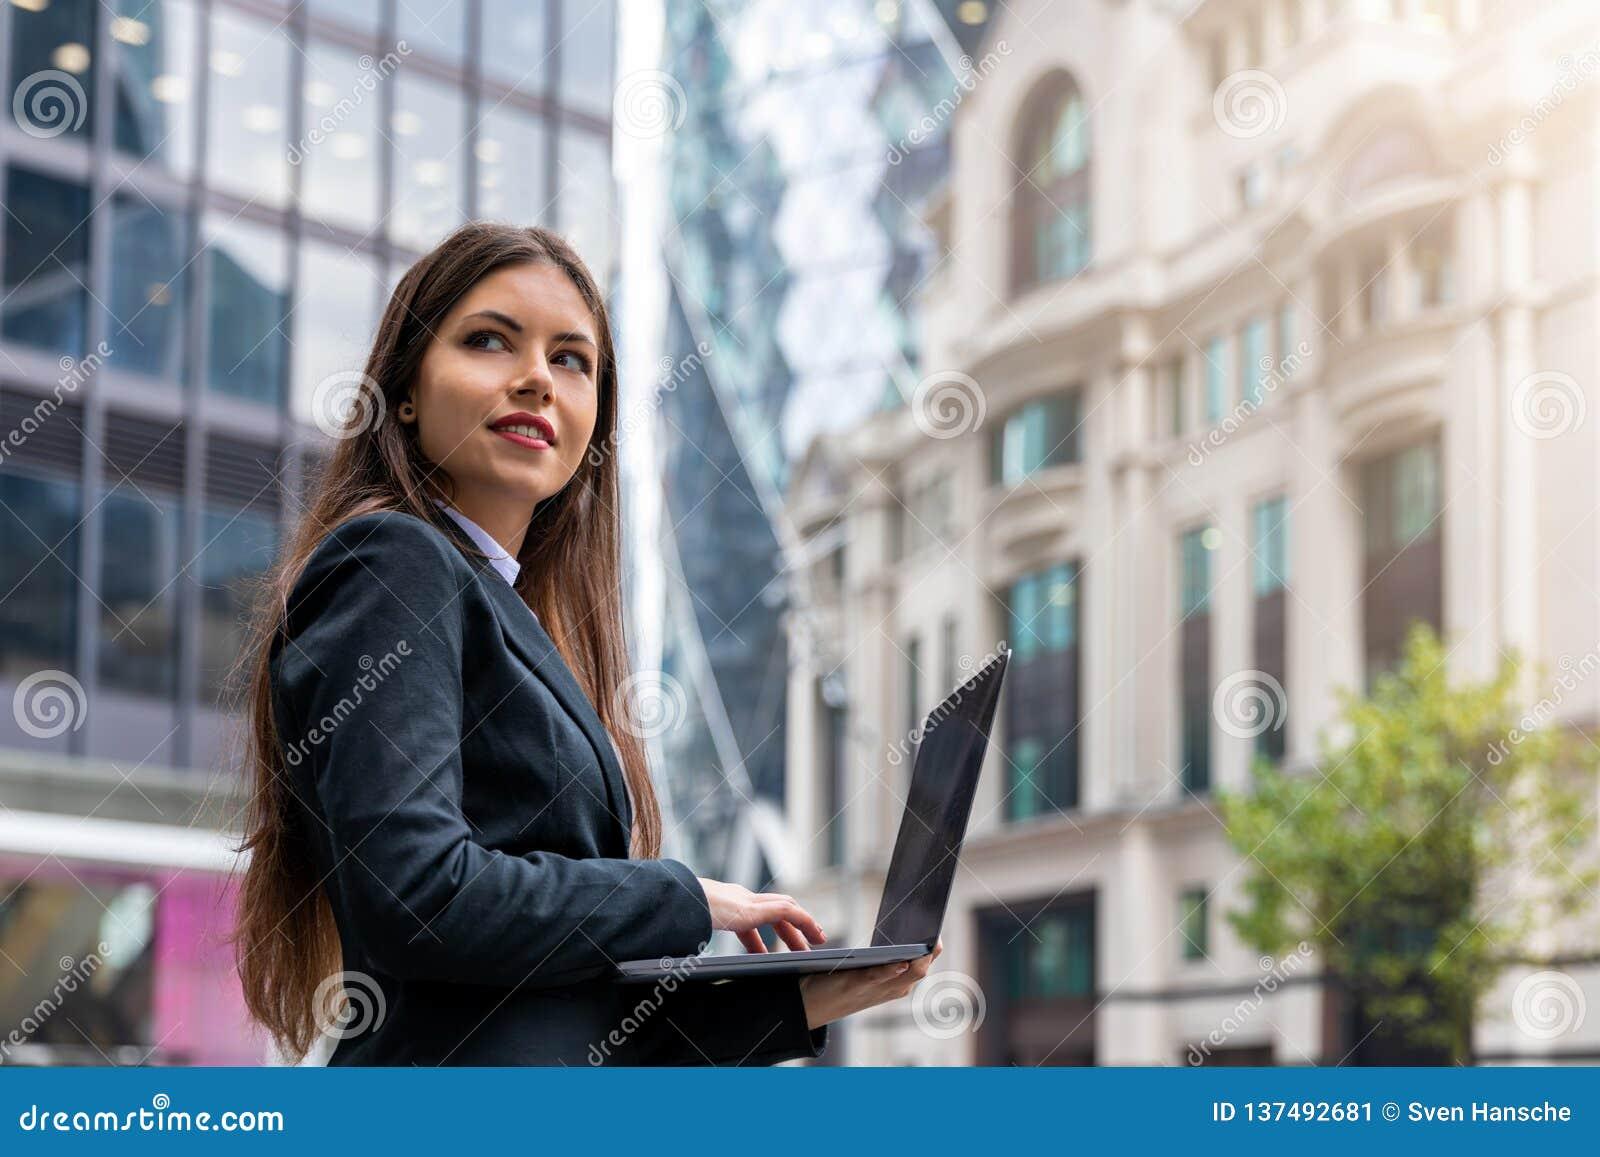 Female entrepreneur in front of office buildings